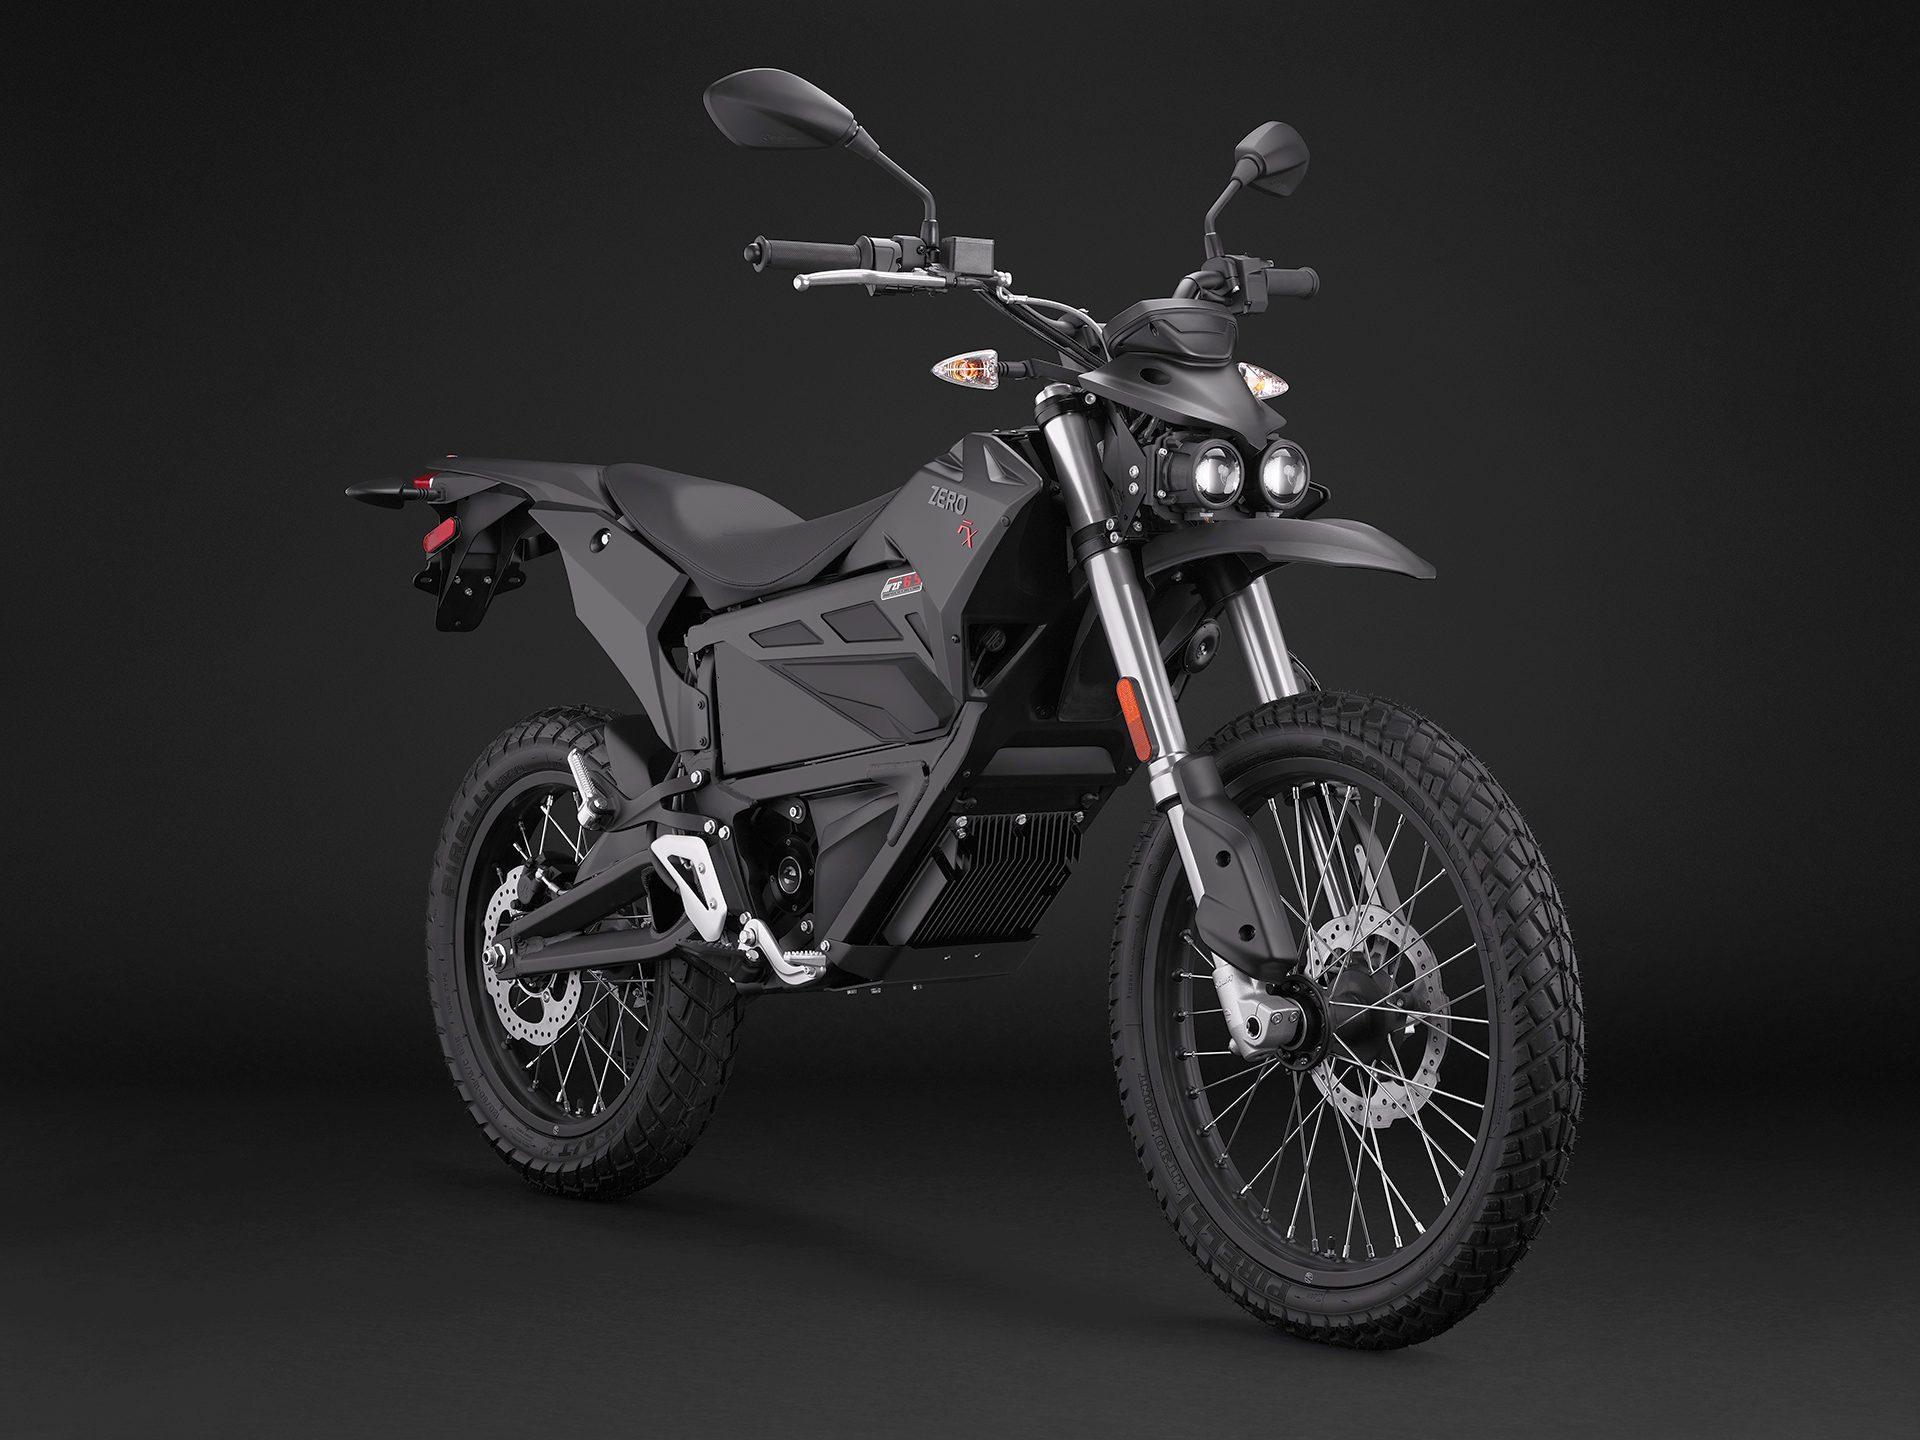 zero motorcycles modelle 2017 motorrad fotos motorrad bilder. Black Bedroom Furniture Sets. Home Design Ideas